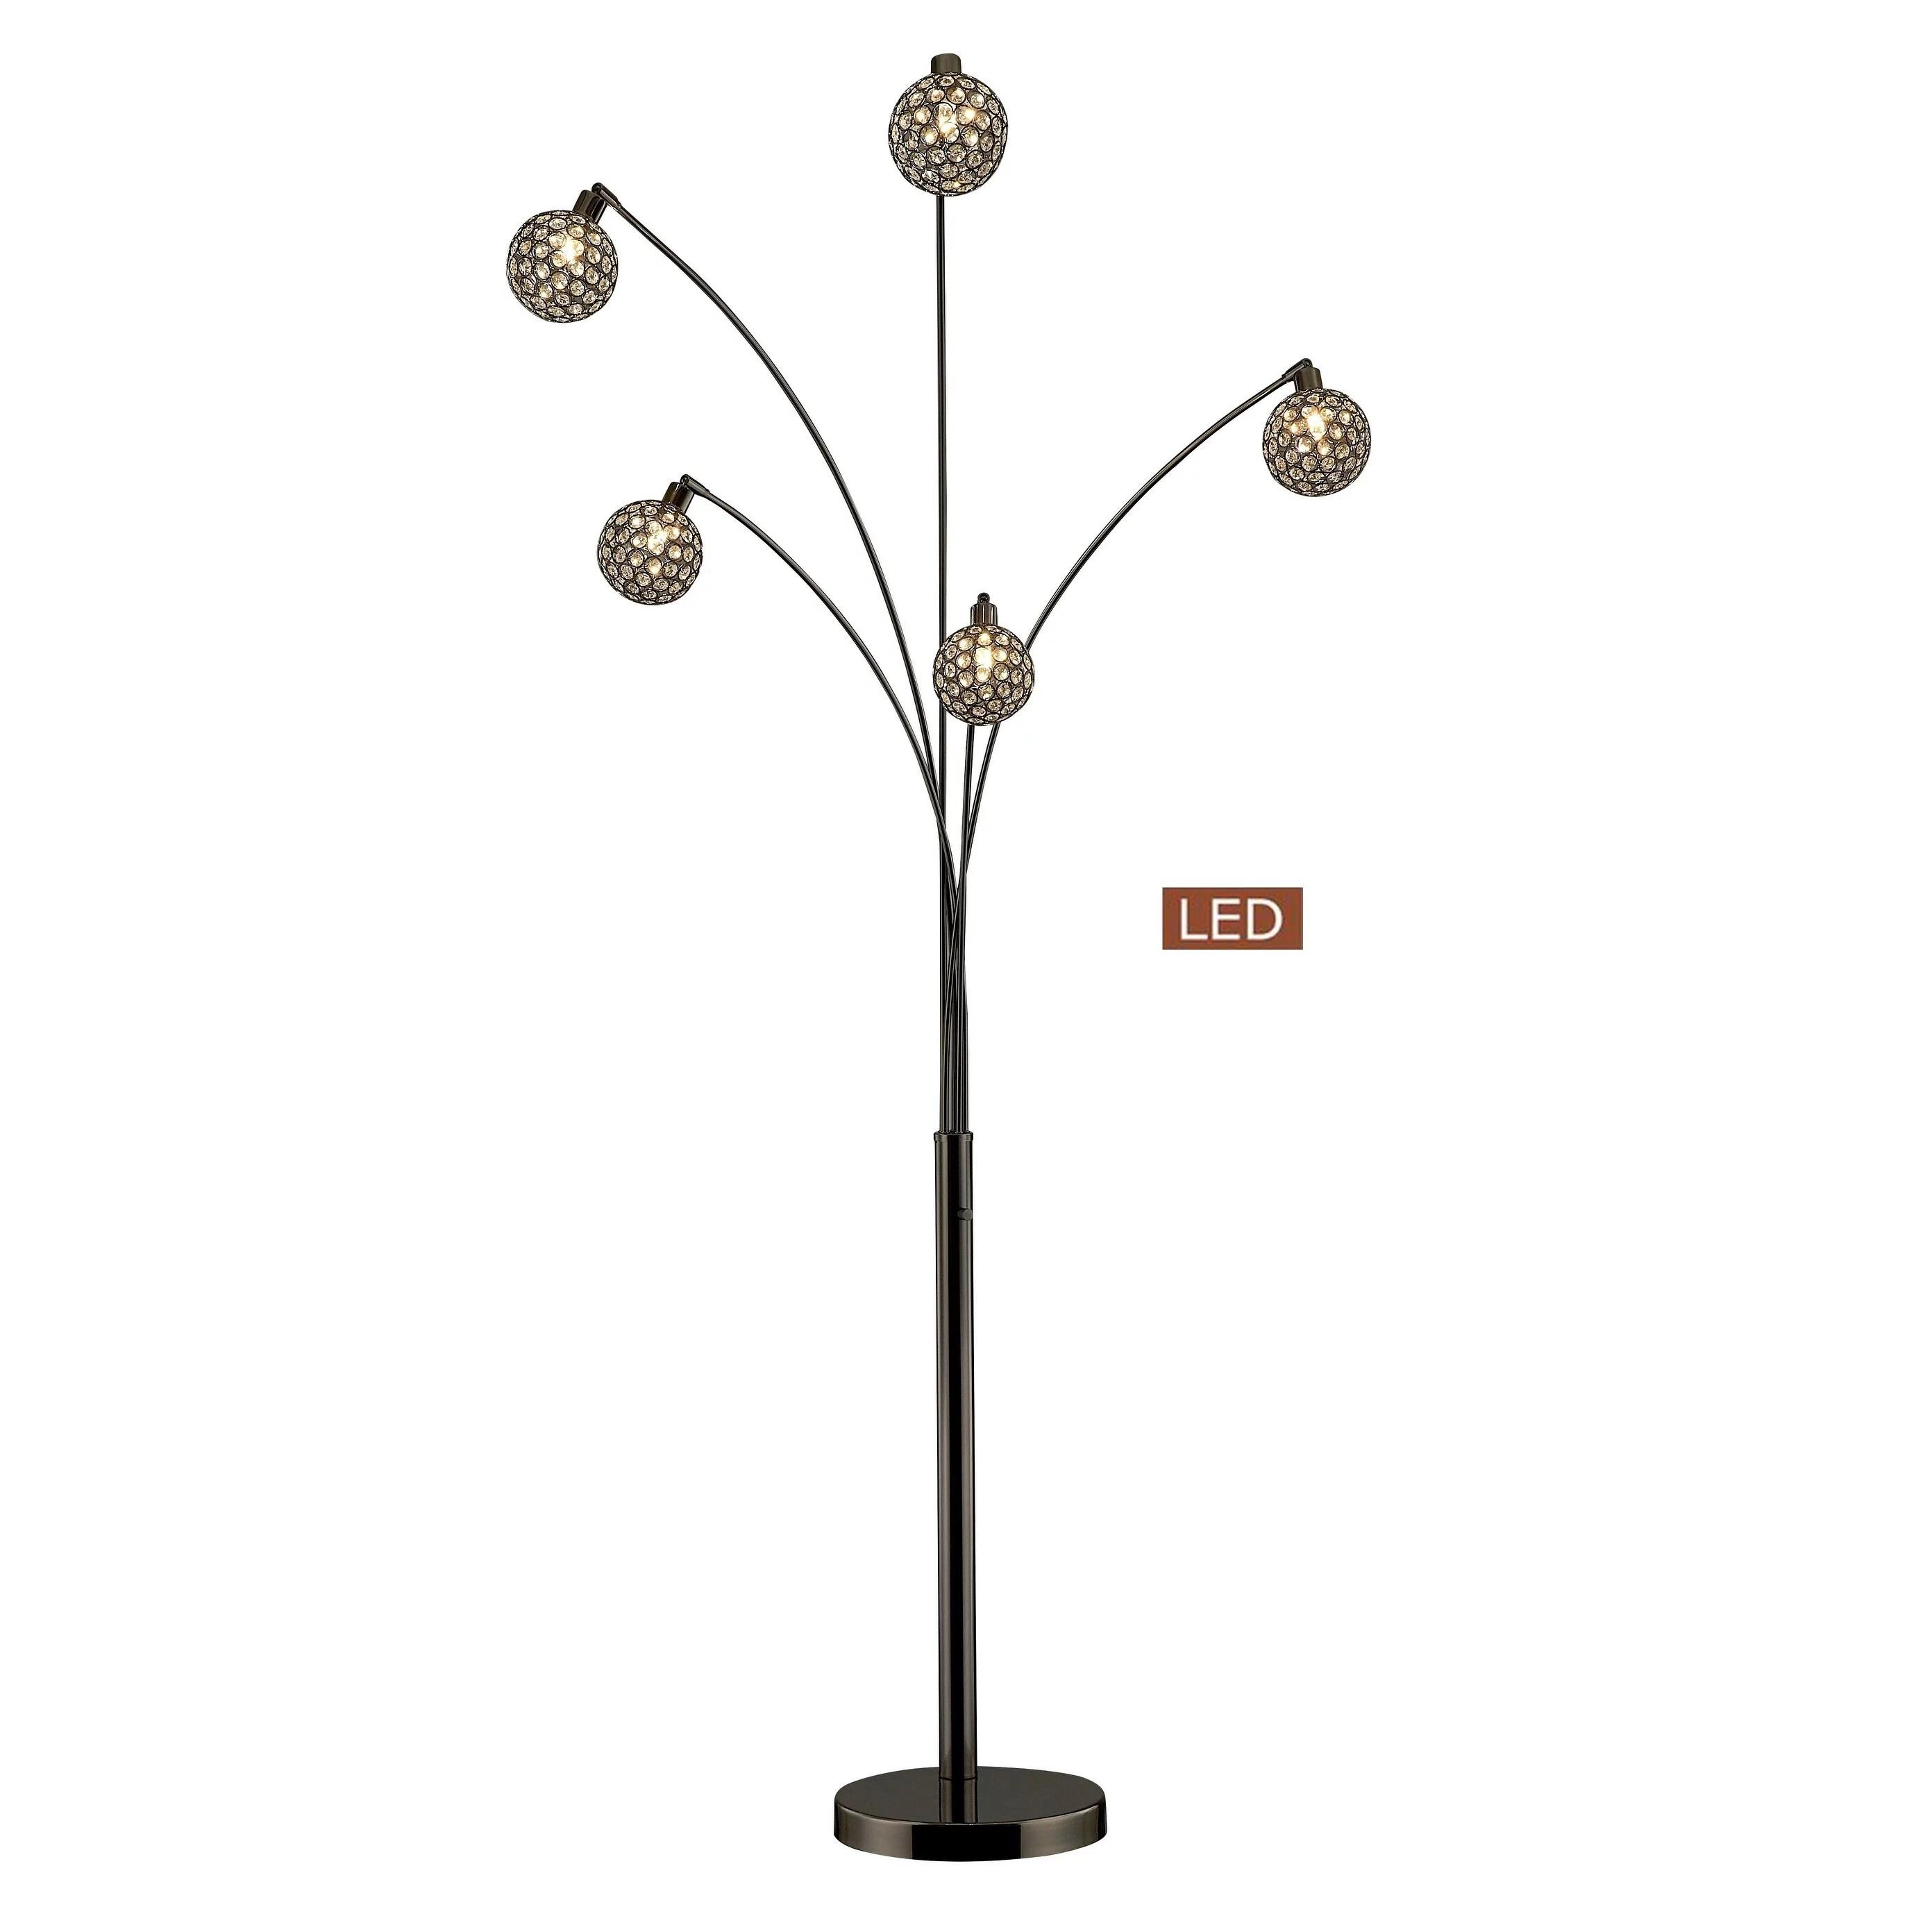 Artiva Manhattan Quan 84 Crystal Led Arch Floor Lamp